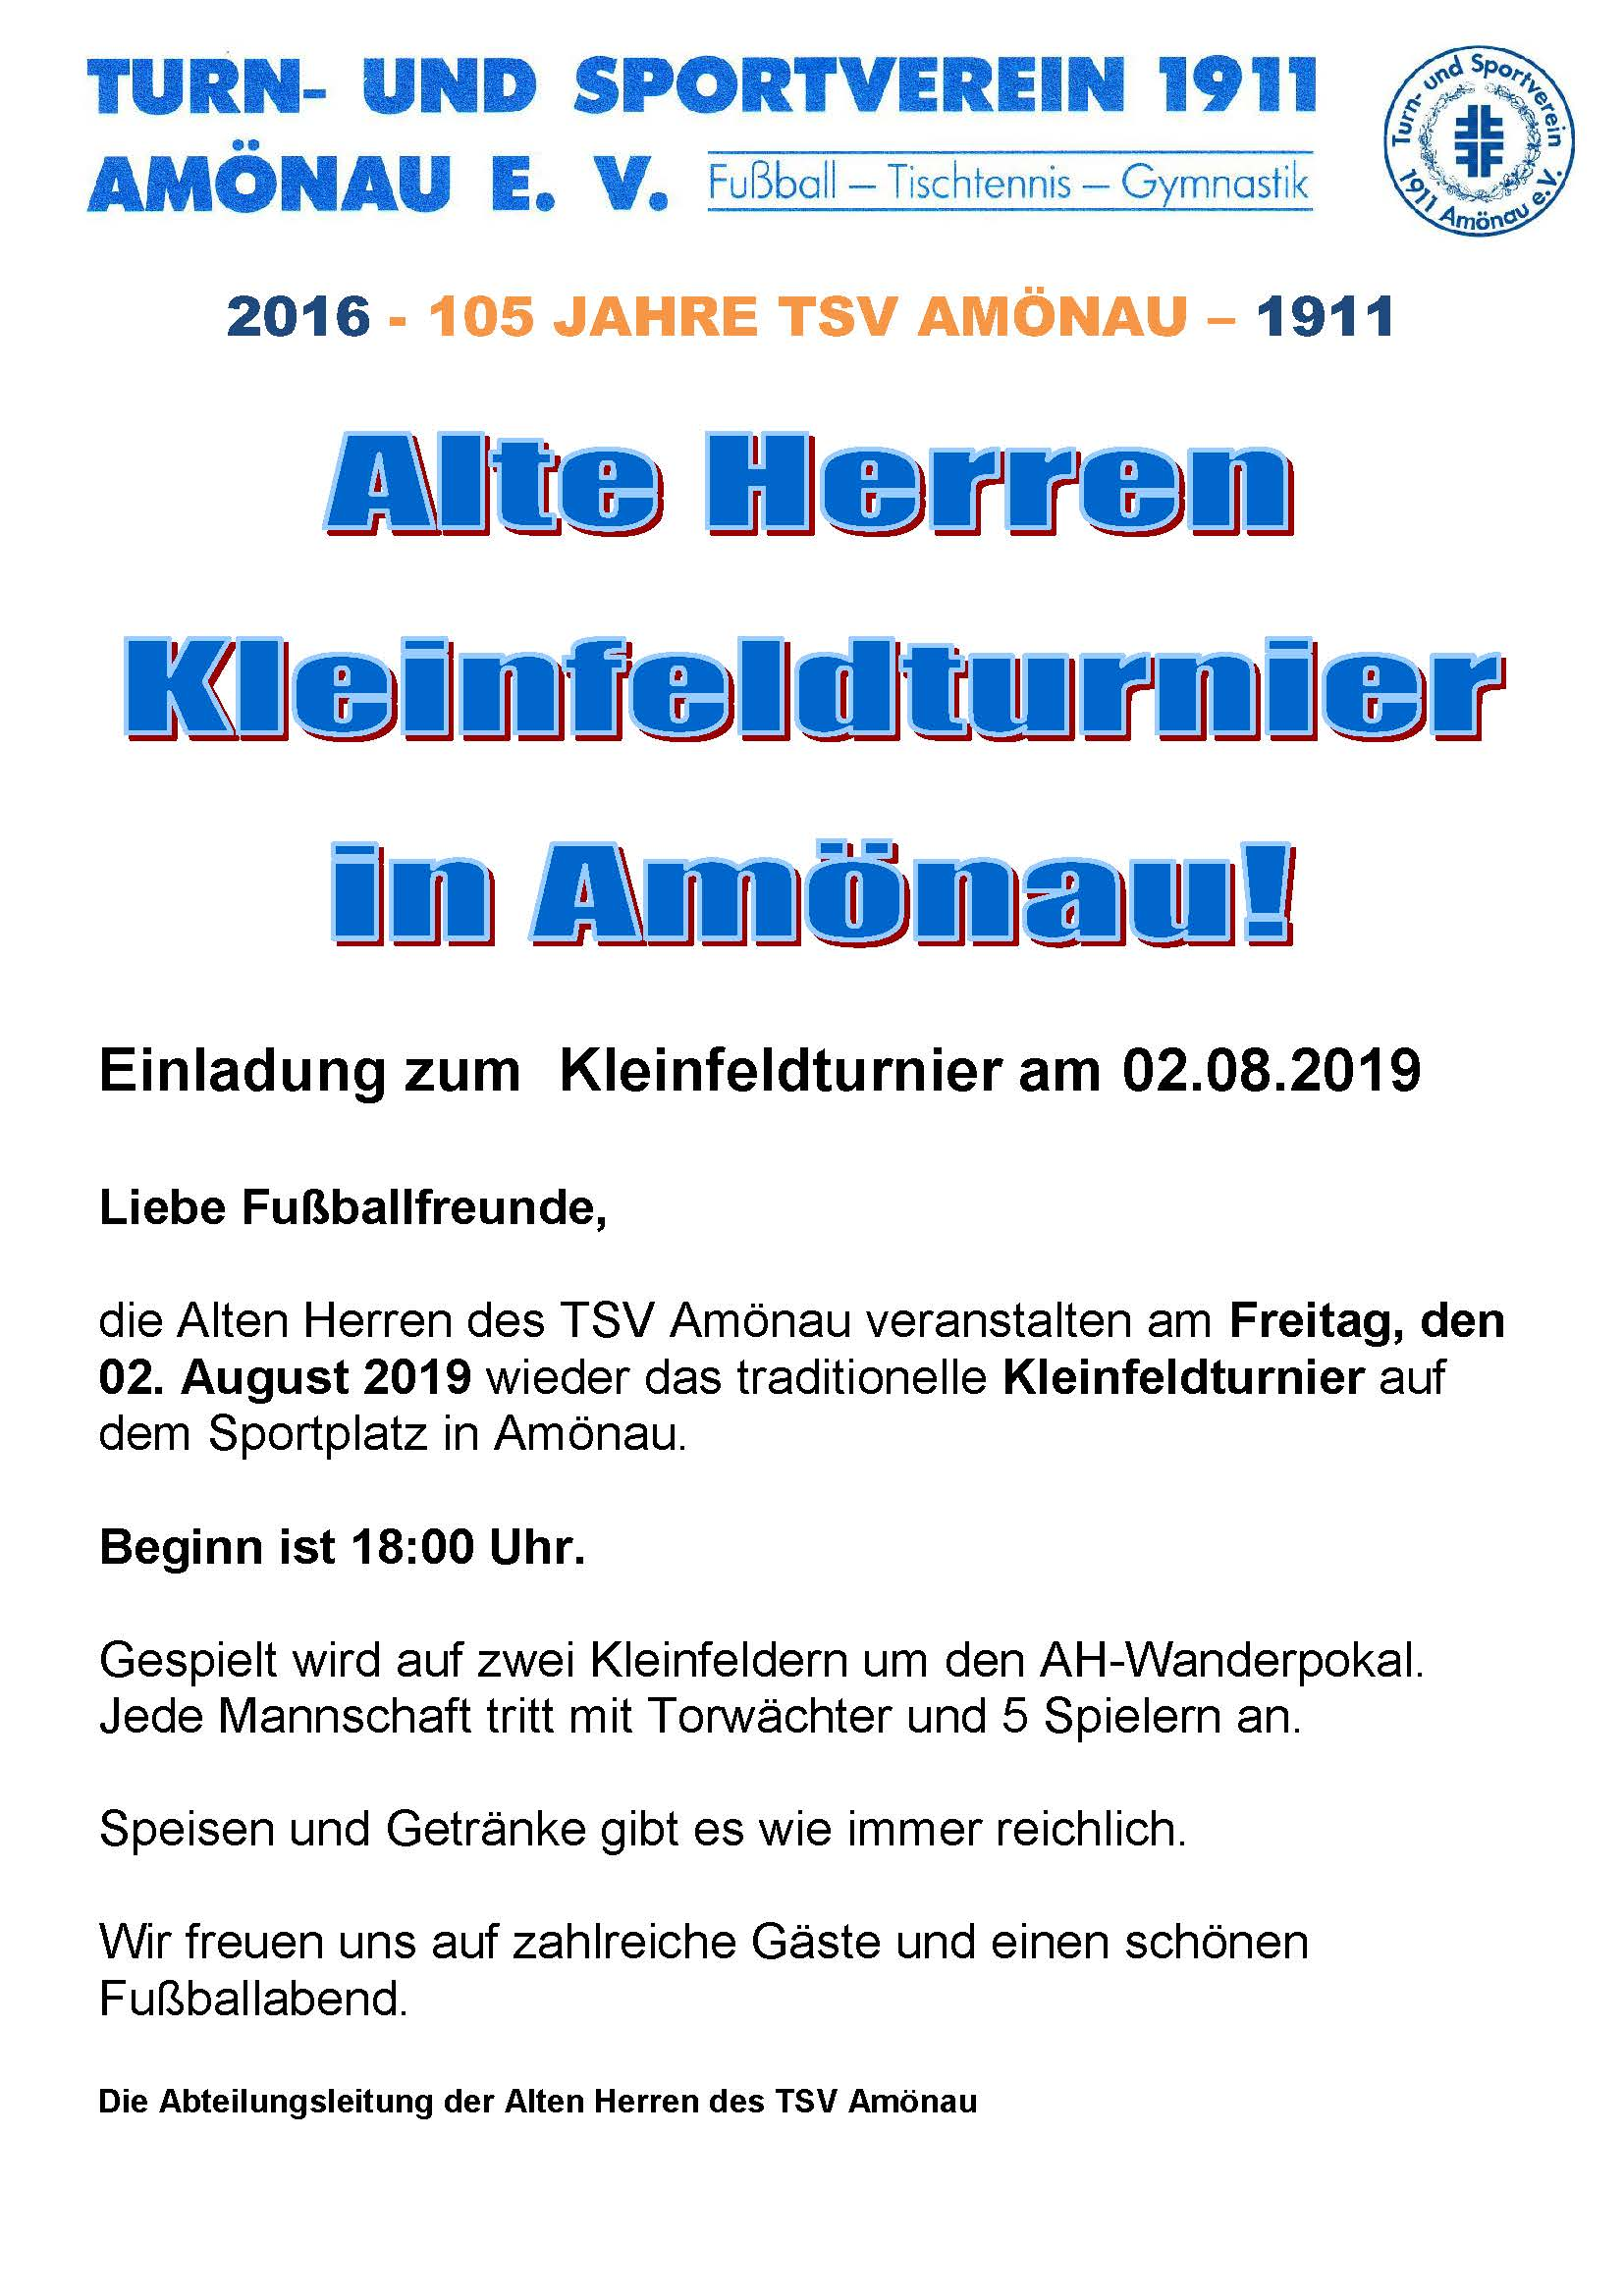 Kleinfeldturnier der AH des TSV Amönau am 02.08.2019